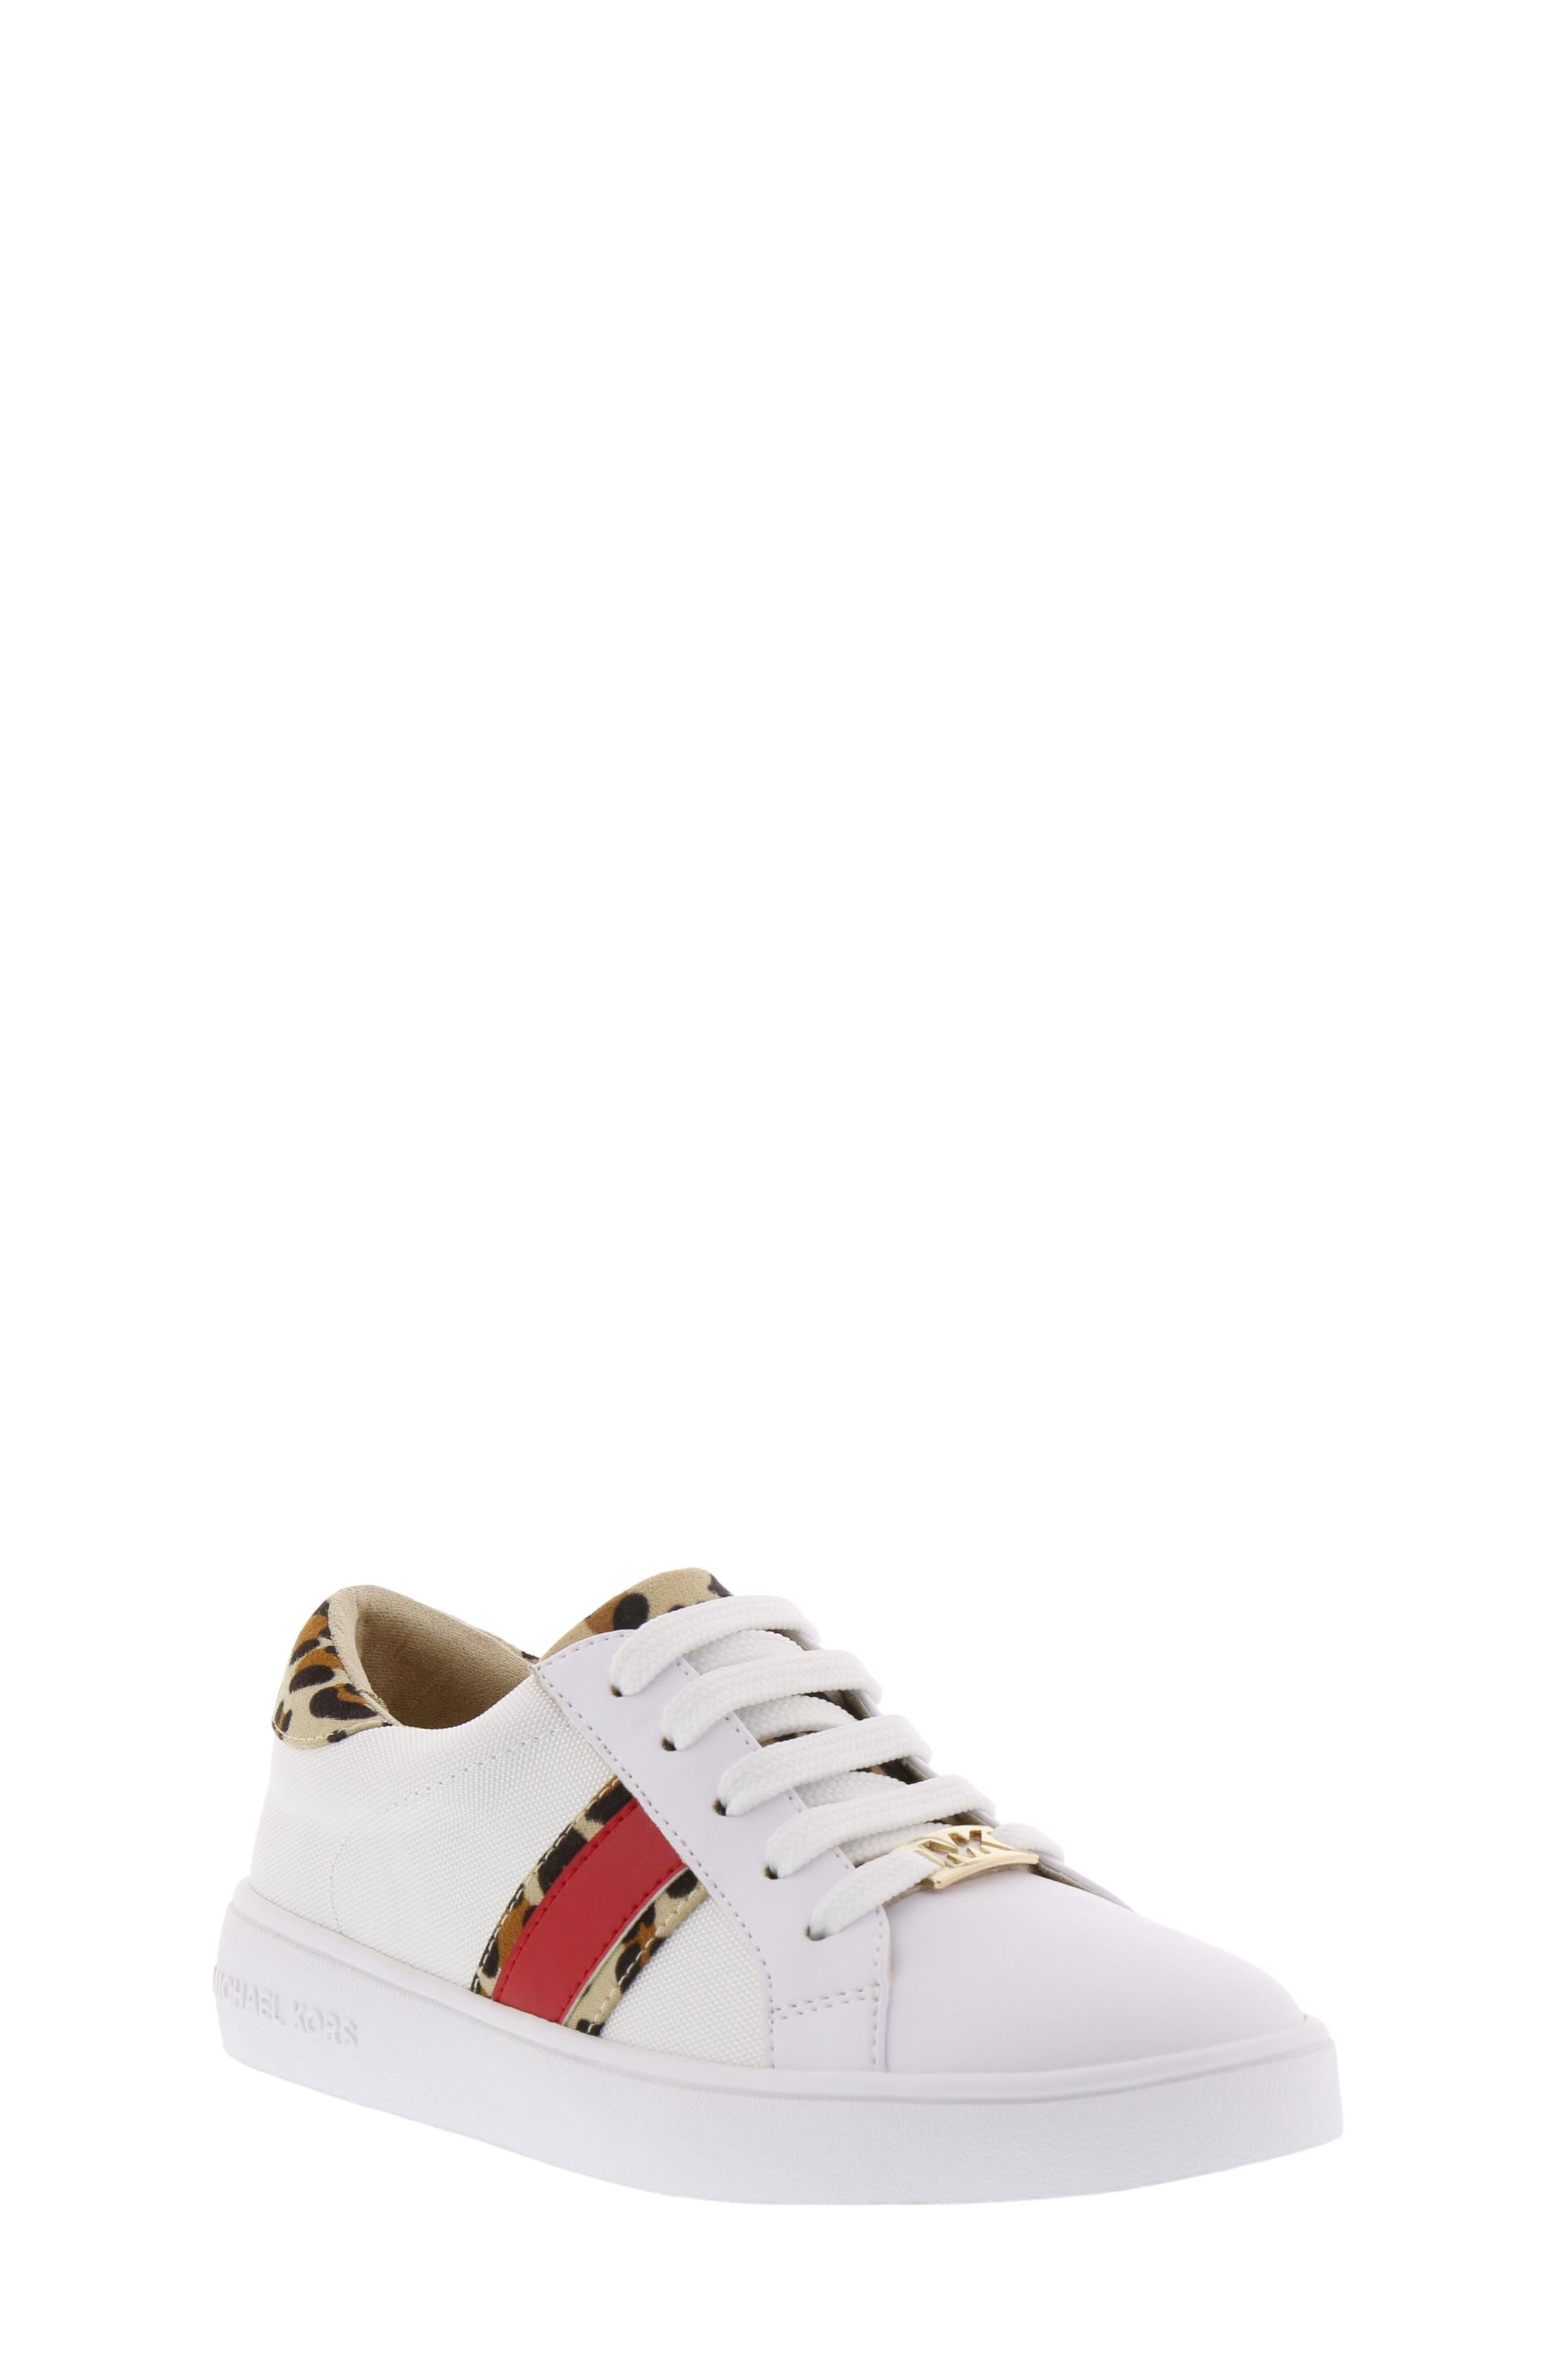 Girls' MICHAEL Michael Kors Shoes